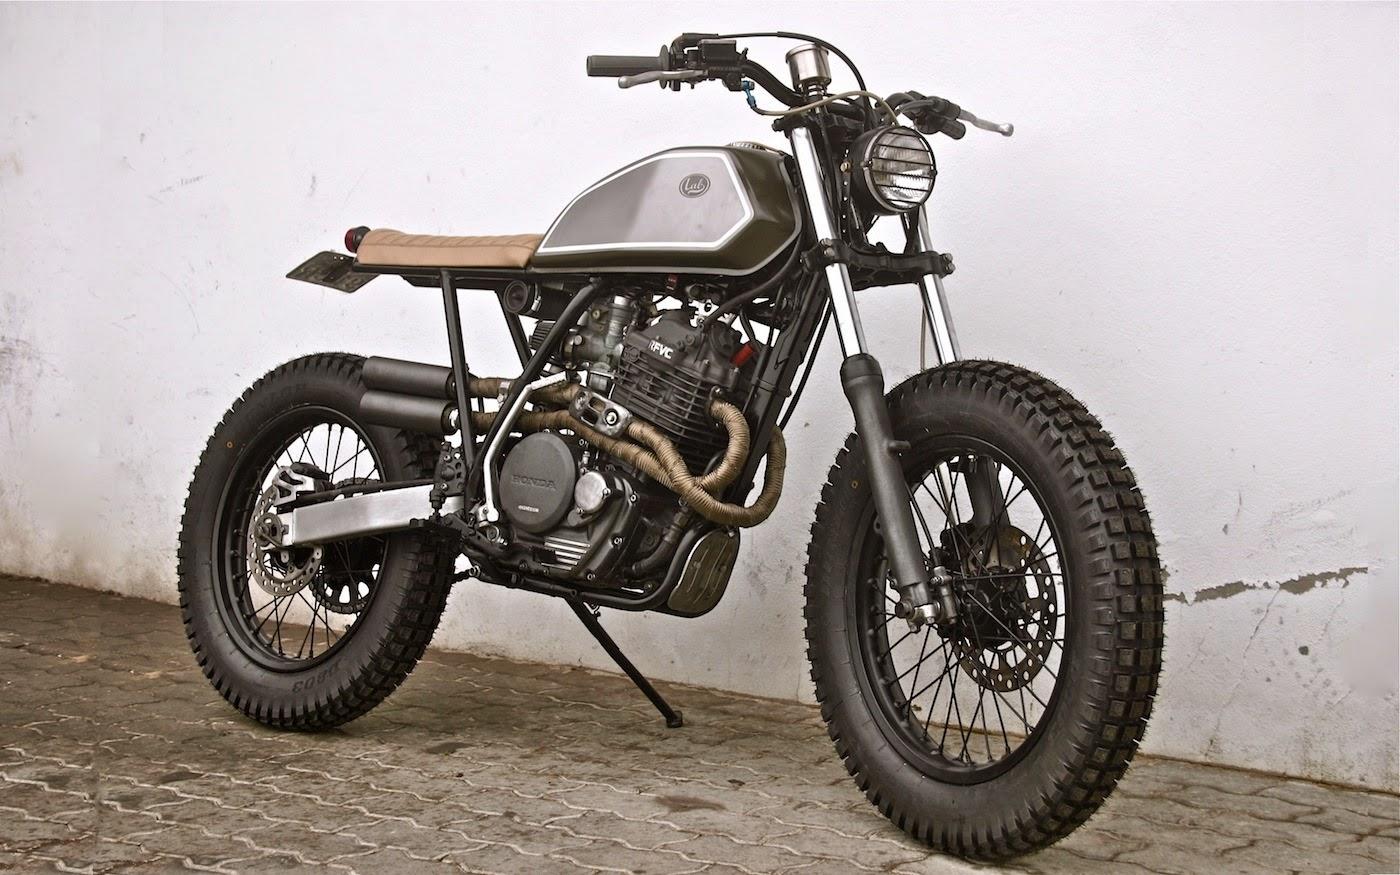 Honda Xr 600 Quot Scrambler Quot By Lab Motorcycle Lsr Bikes